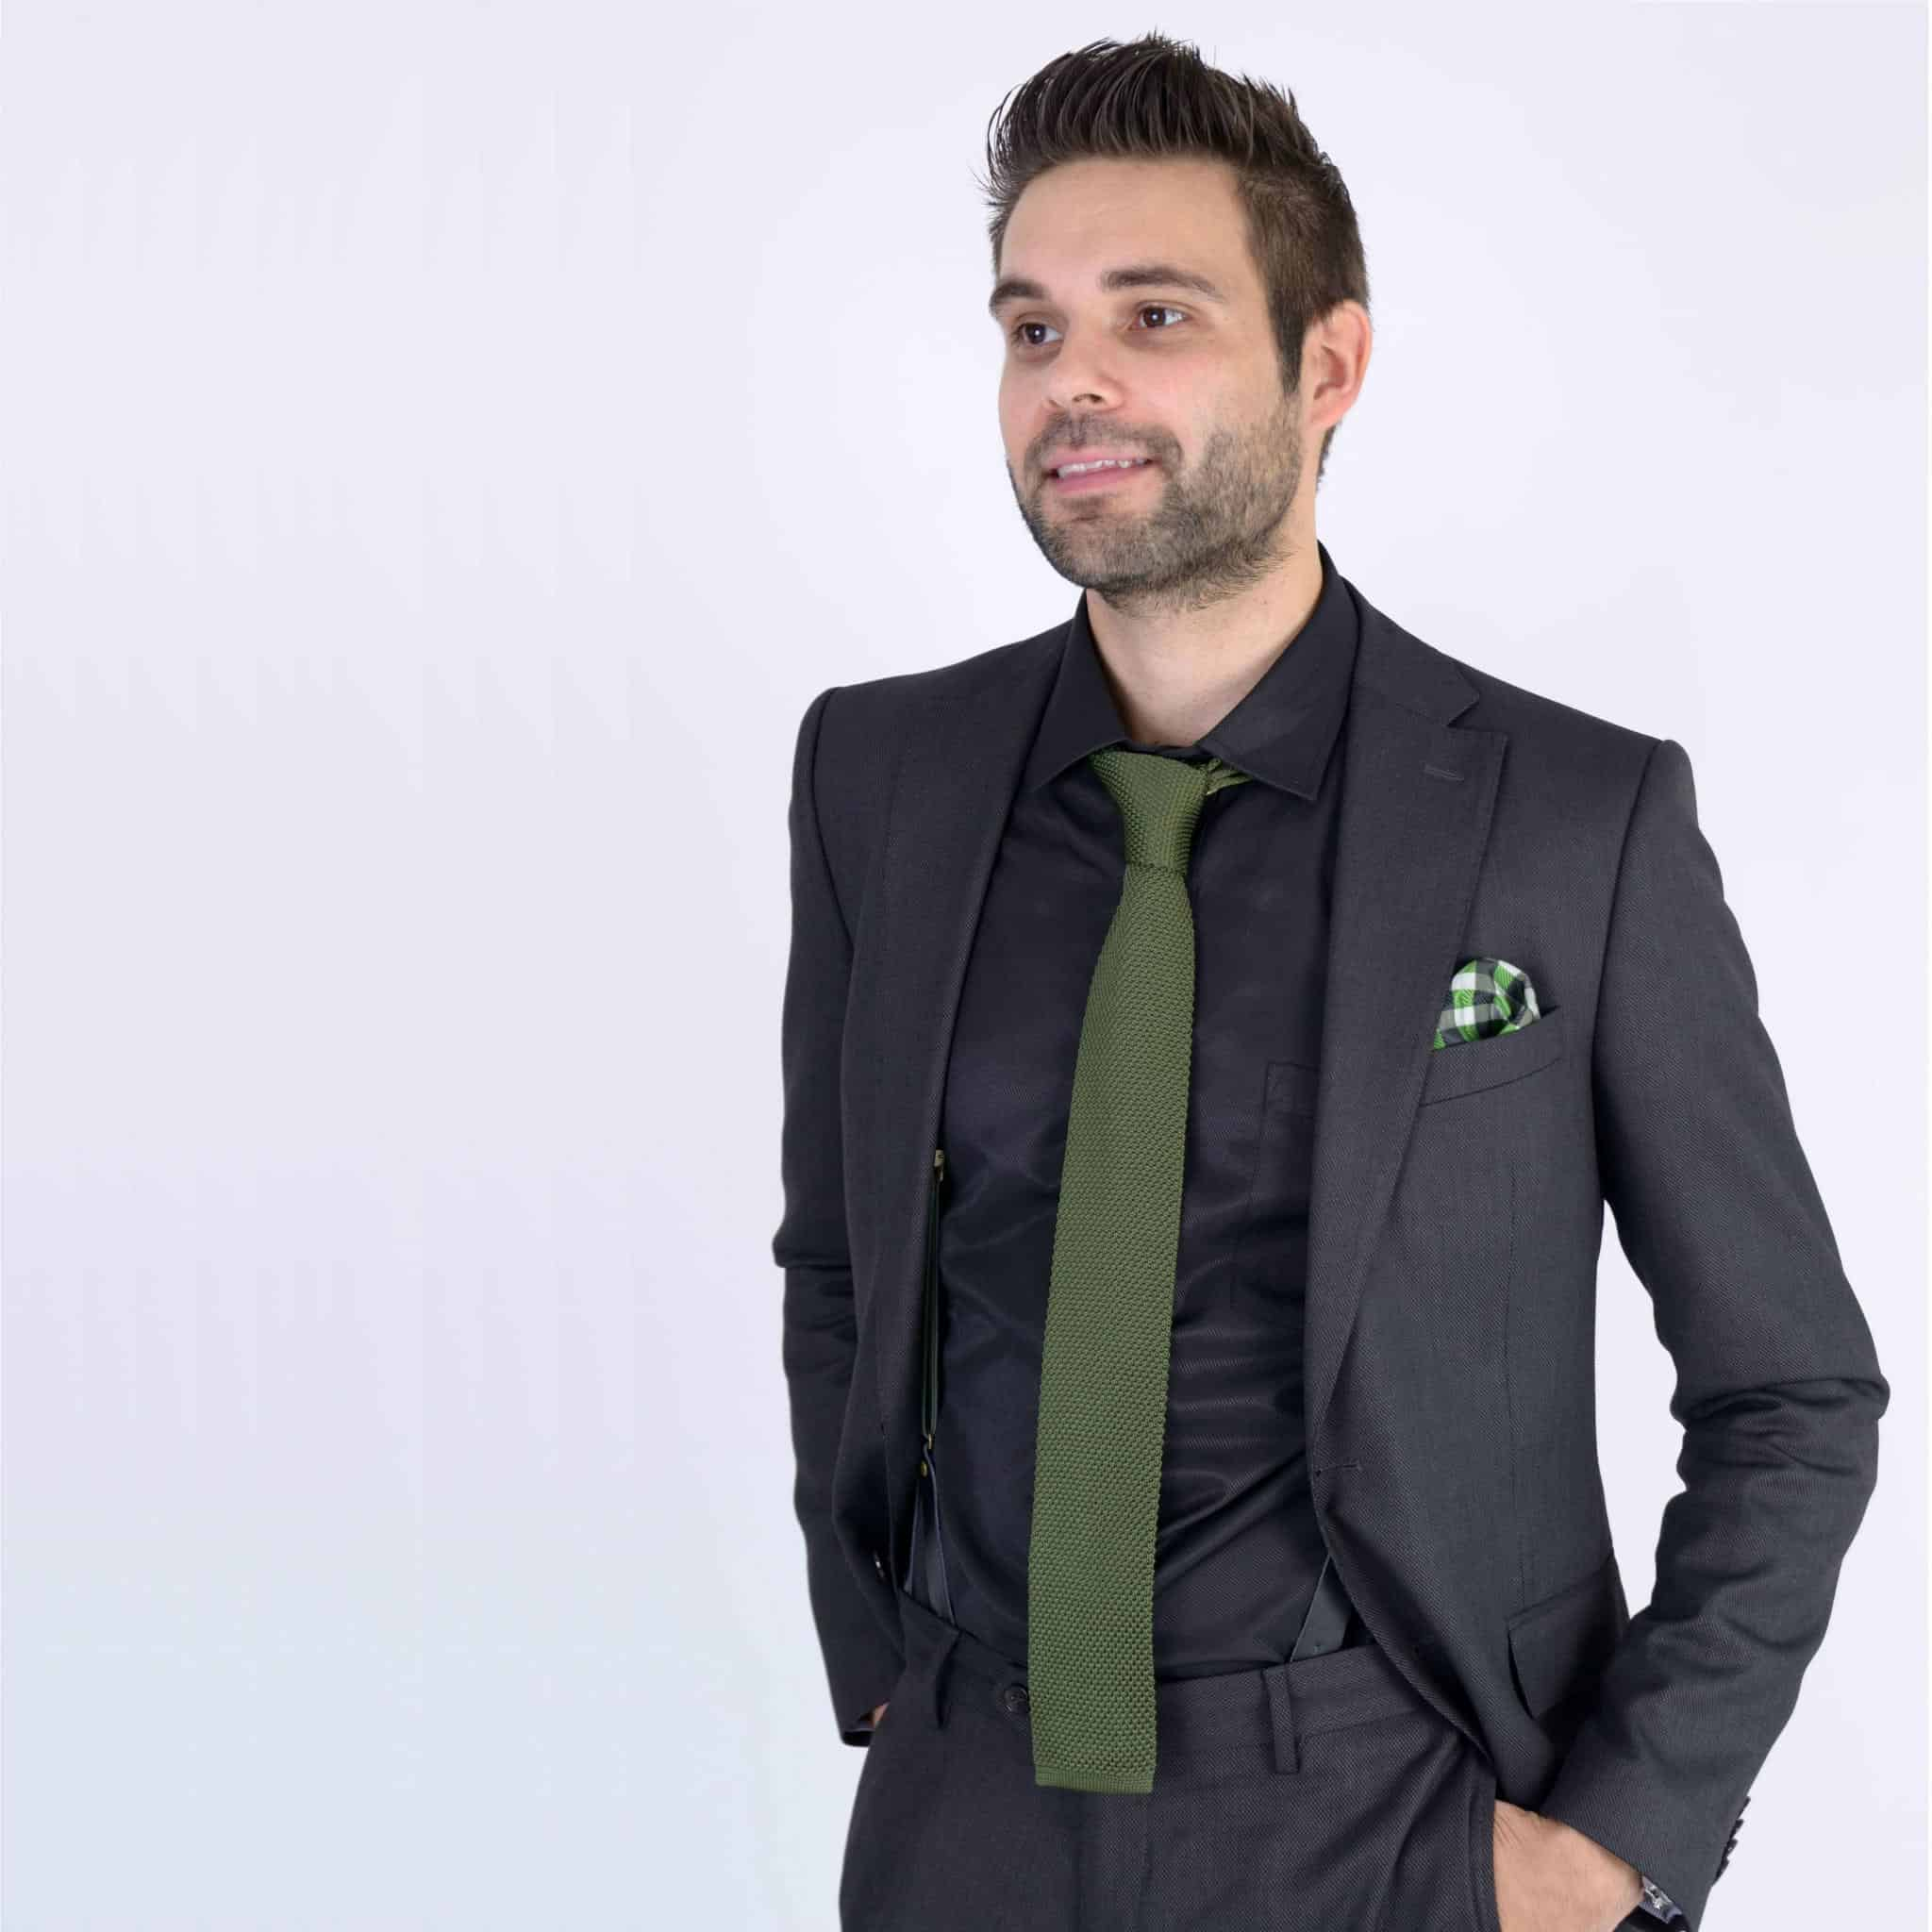 zwart-overhemd-groene-gebreide-stropdas